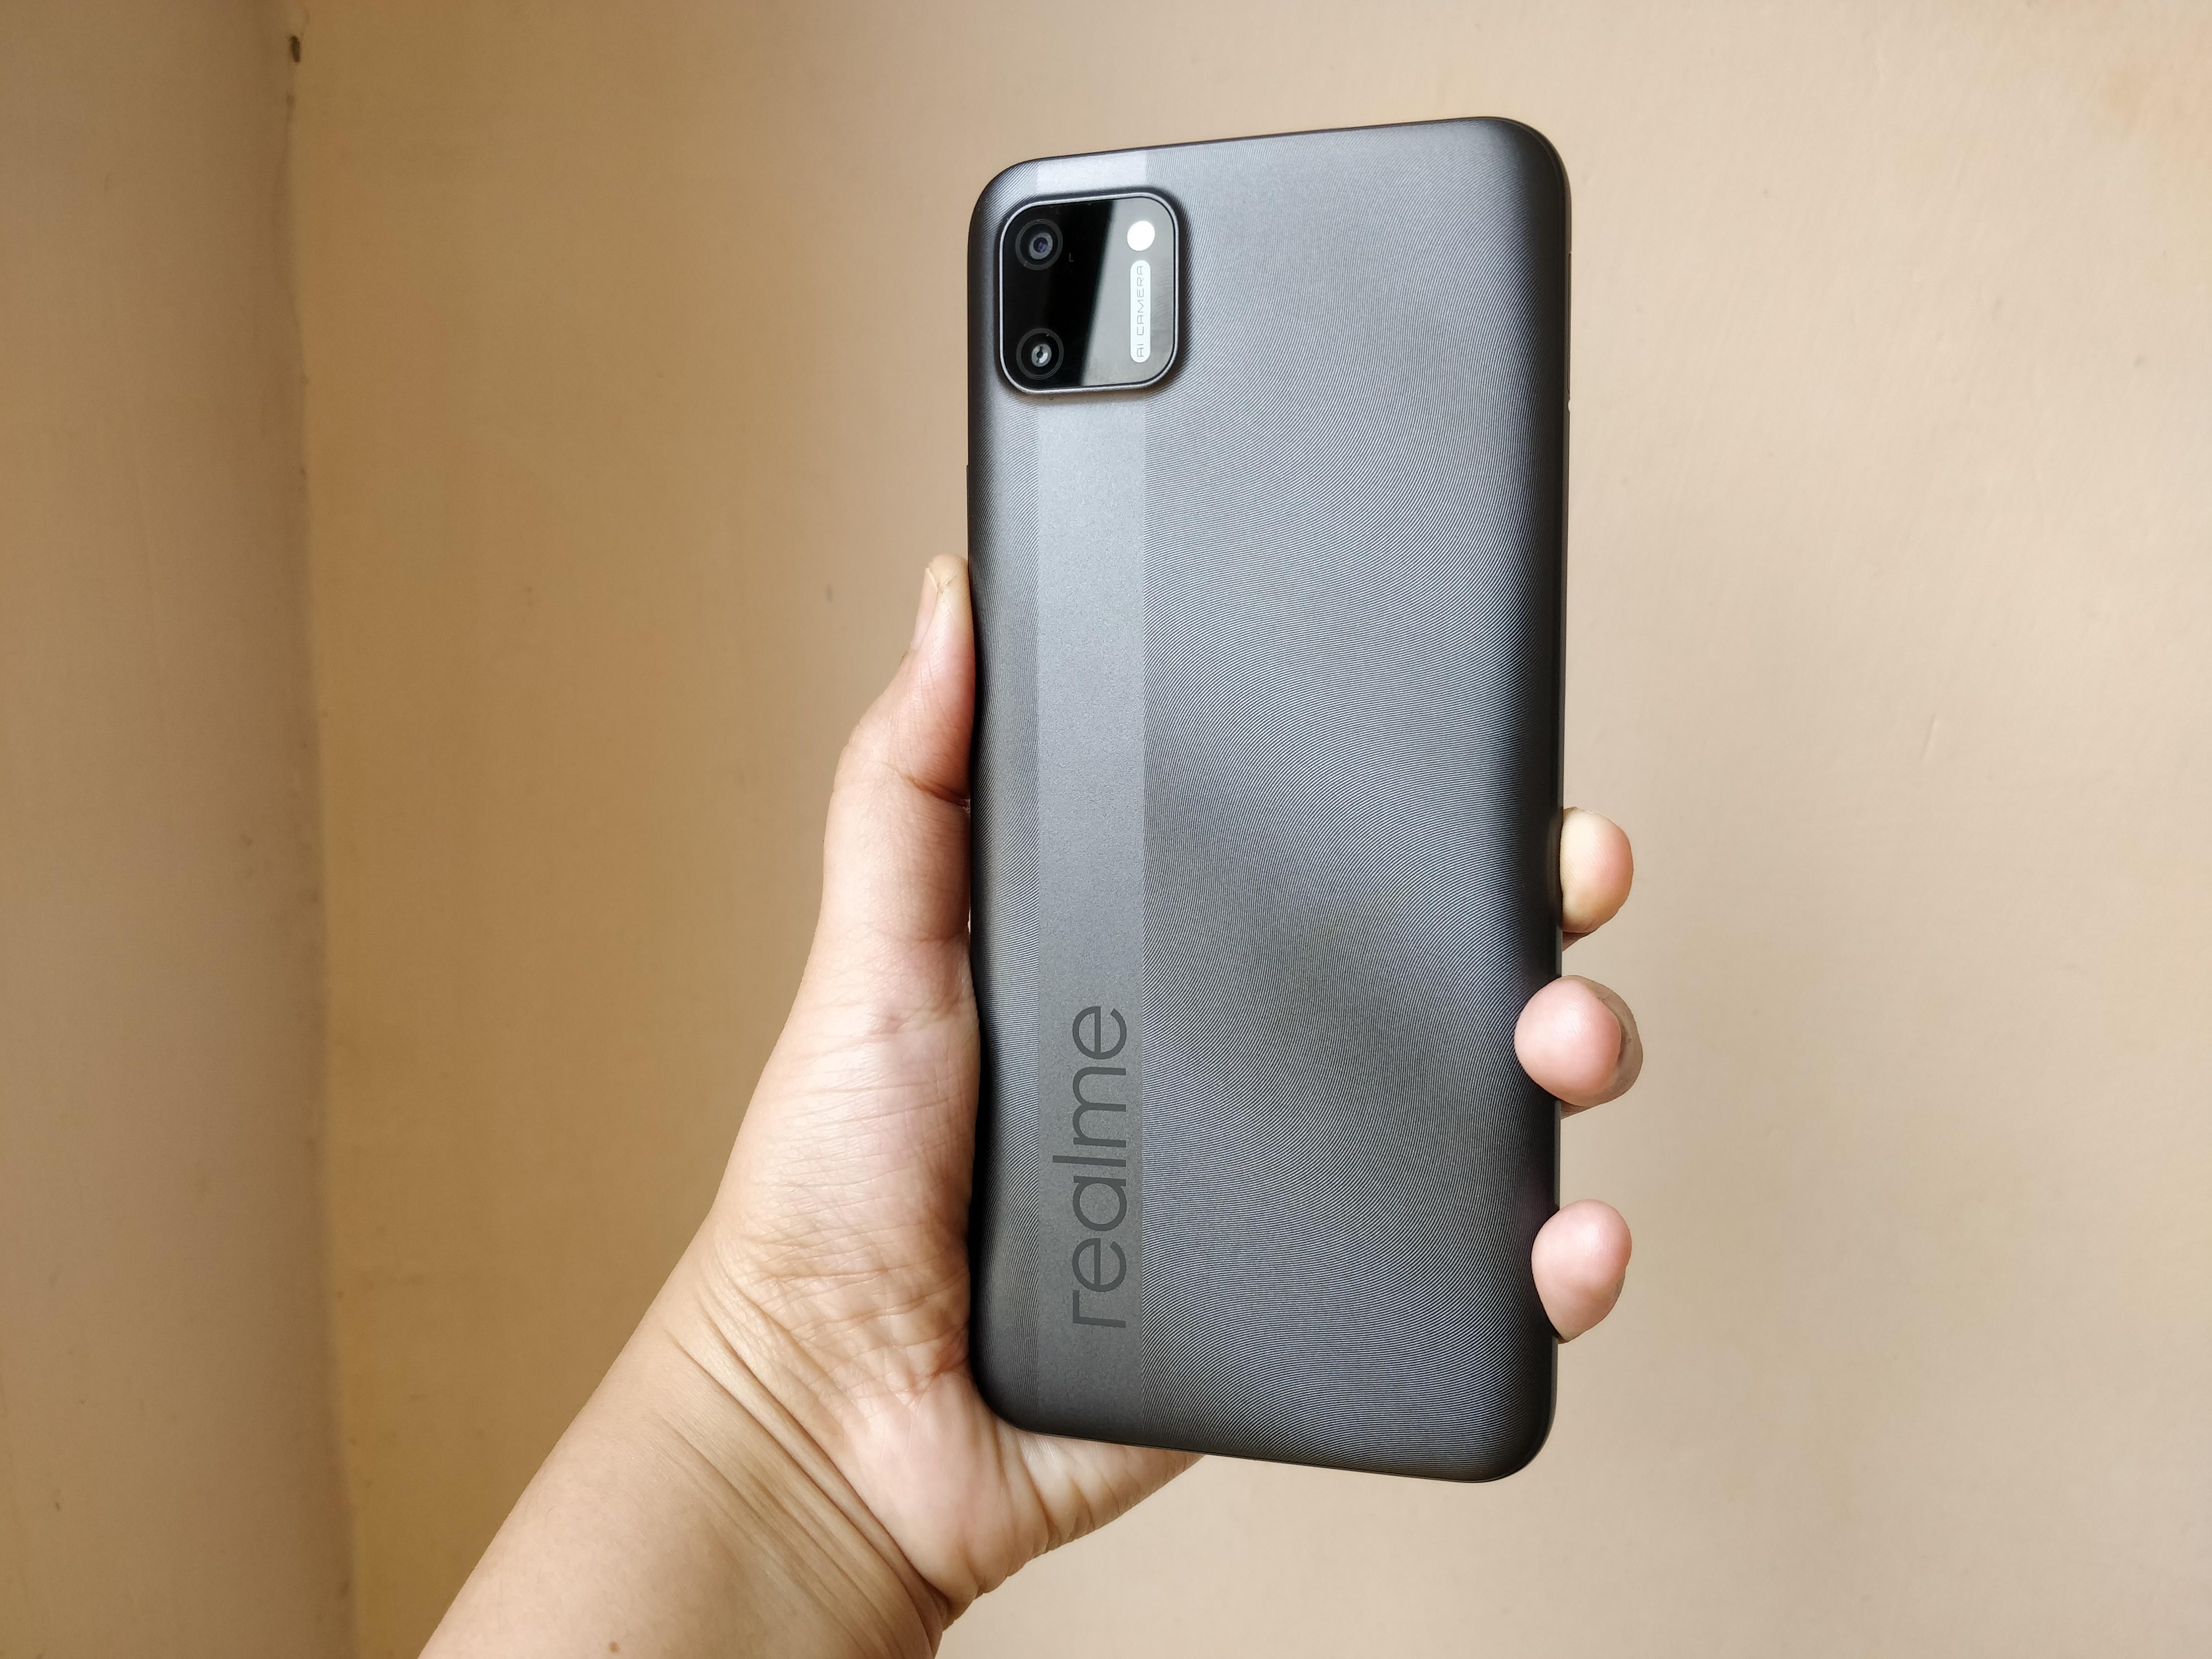 Realme C11 Review: Realme C11 Review & Rating